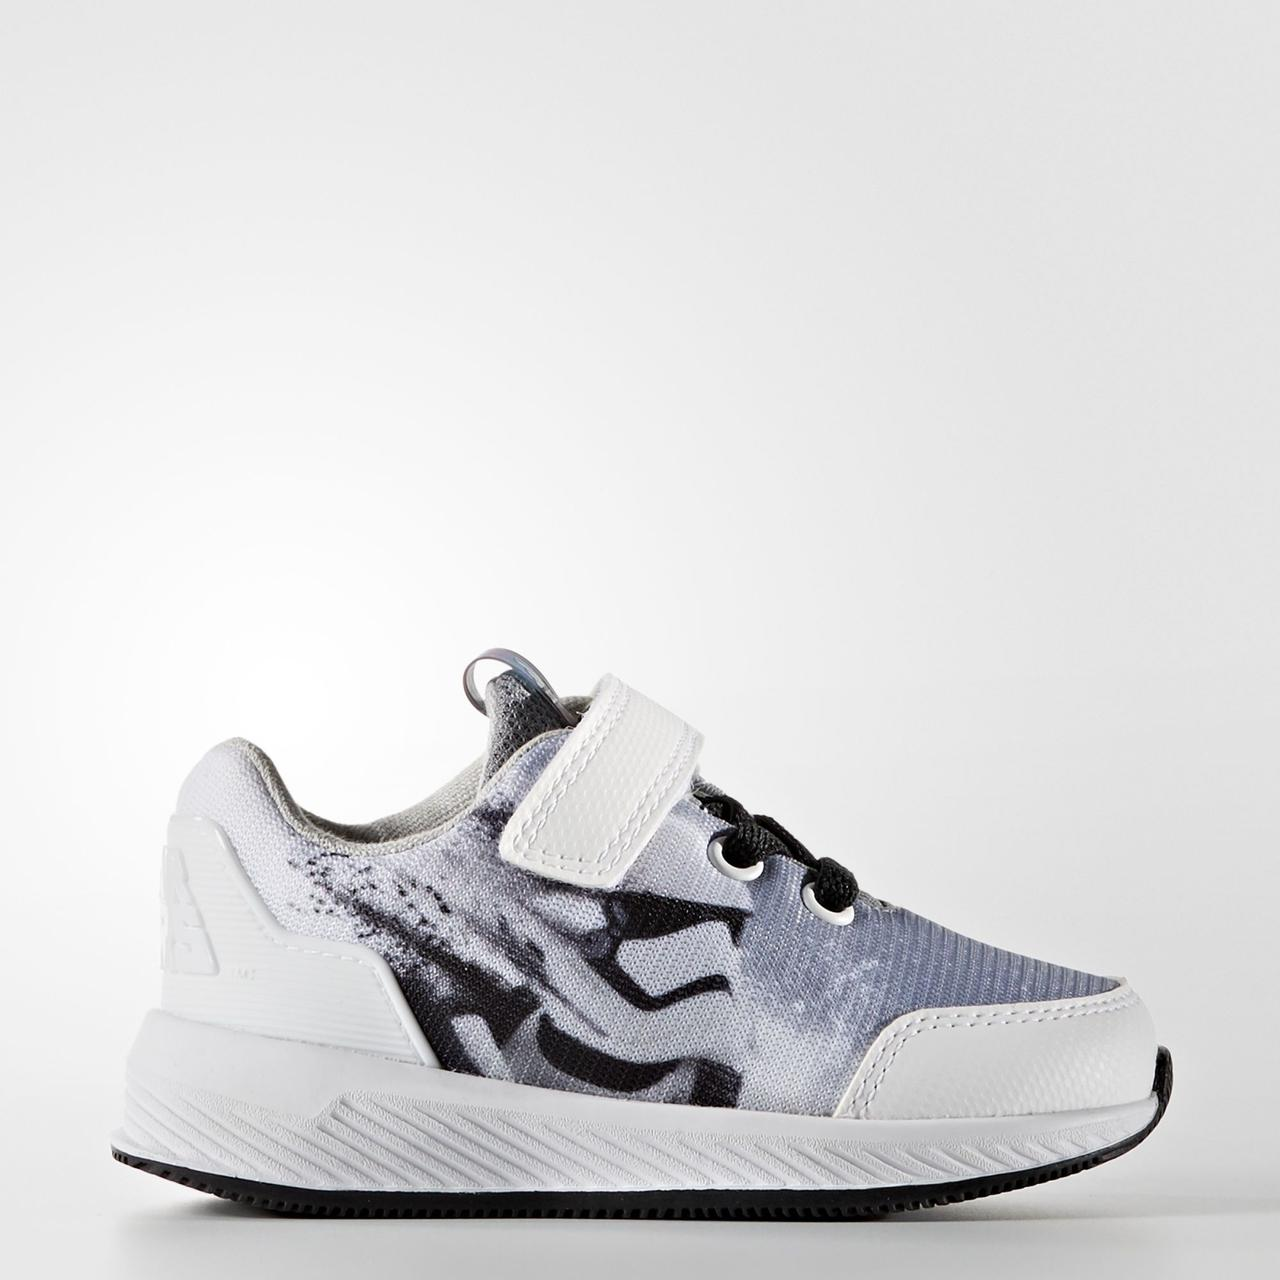 Купить Детские кроссовки Adidas Performance Star Wars (Артикул ... 6b27c96760b